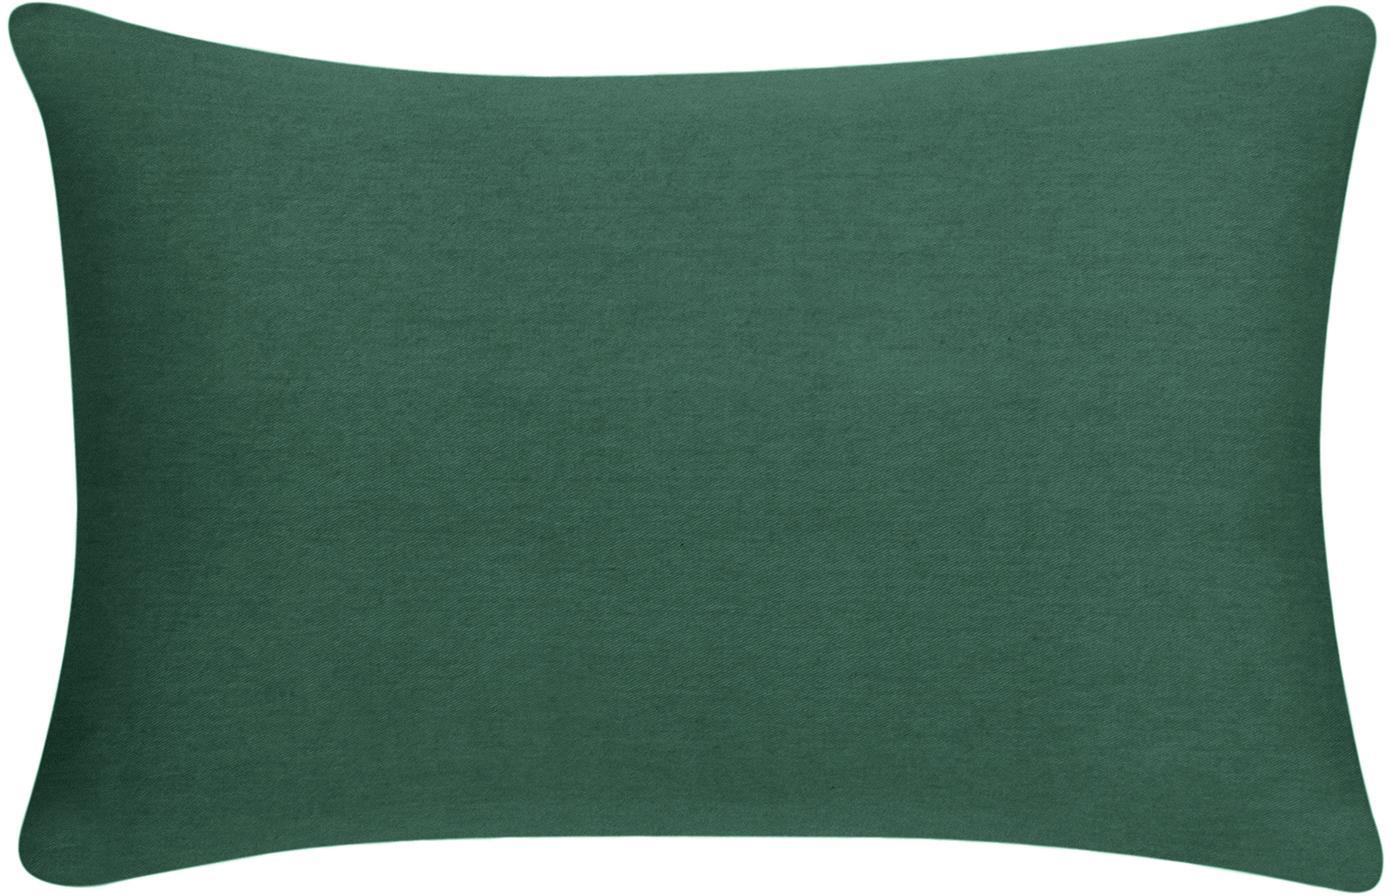 Federa arredo in cotone verde Mads, 100% cotone, Verde, Larg. 30 x Lung. 50 cm